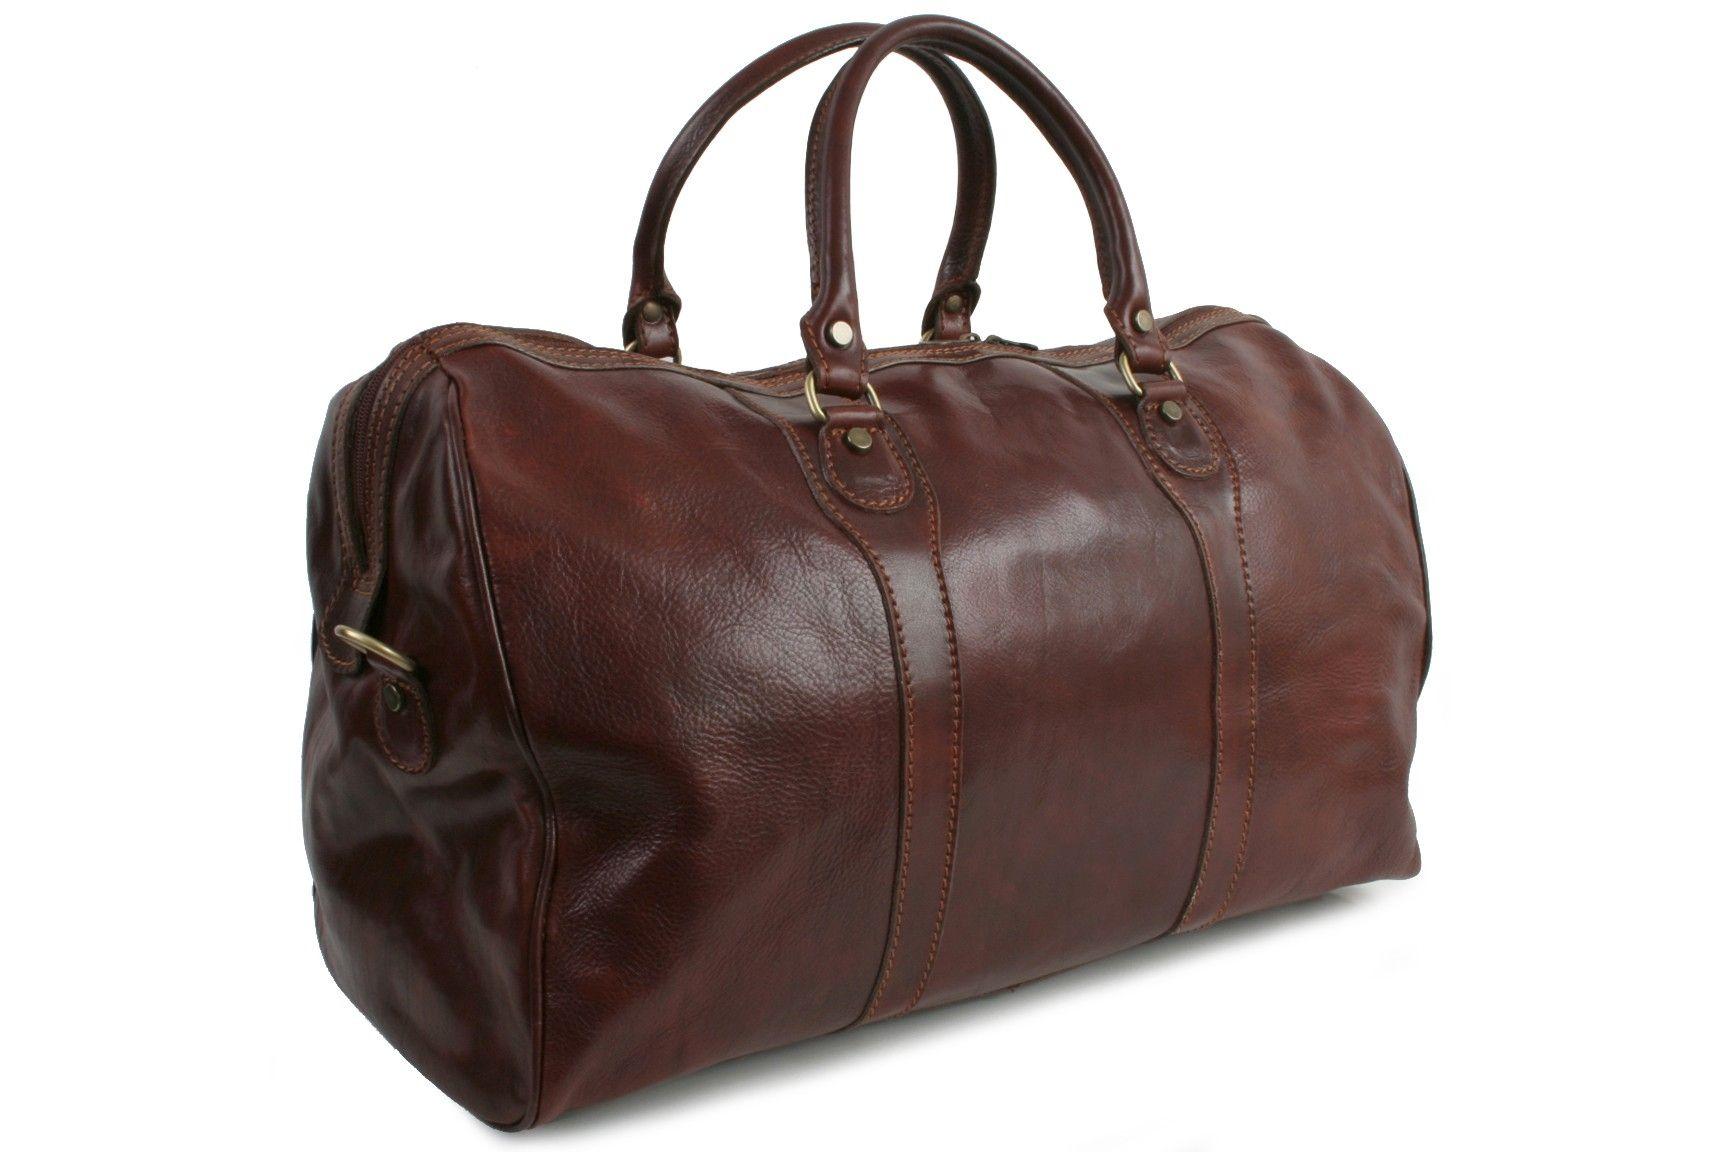 2a0e7274ec Marco Polo black leather travel bag